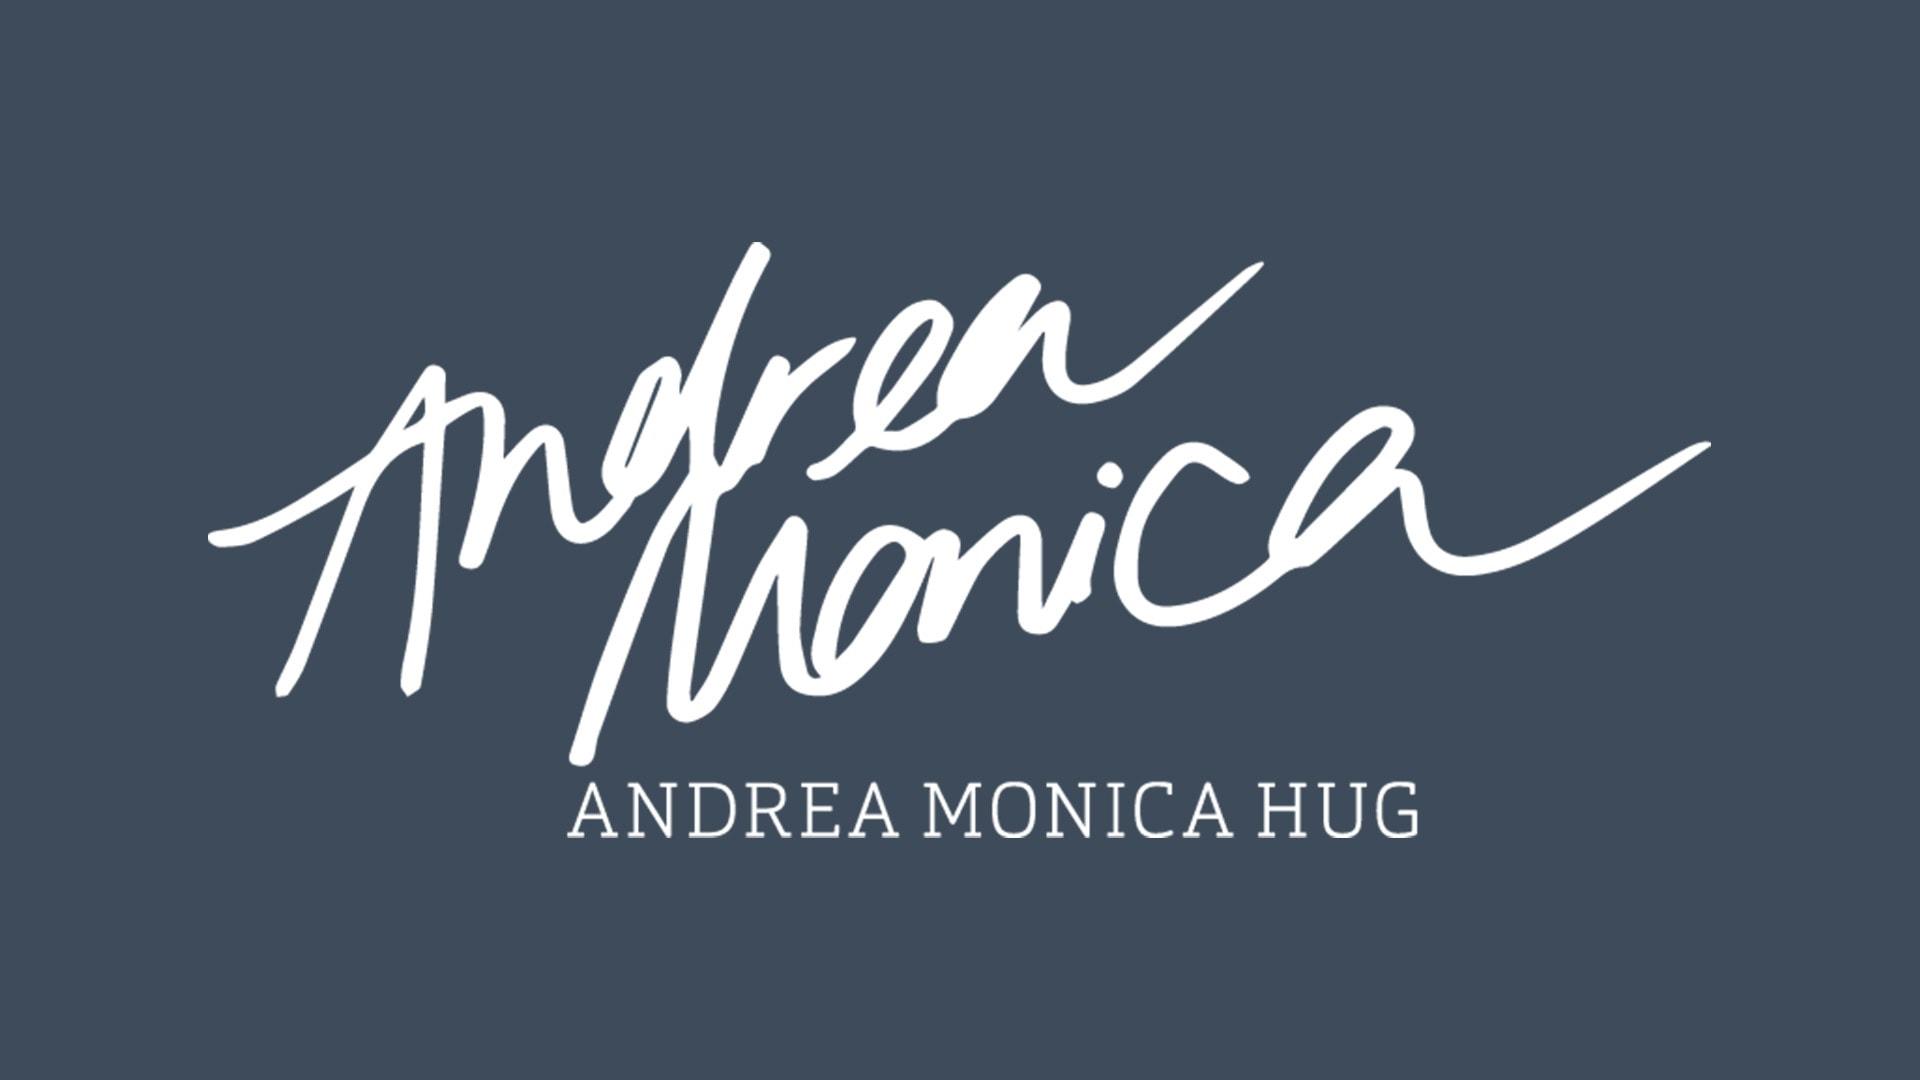 andrea_monica_hug_logo_dunkel